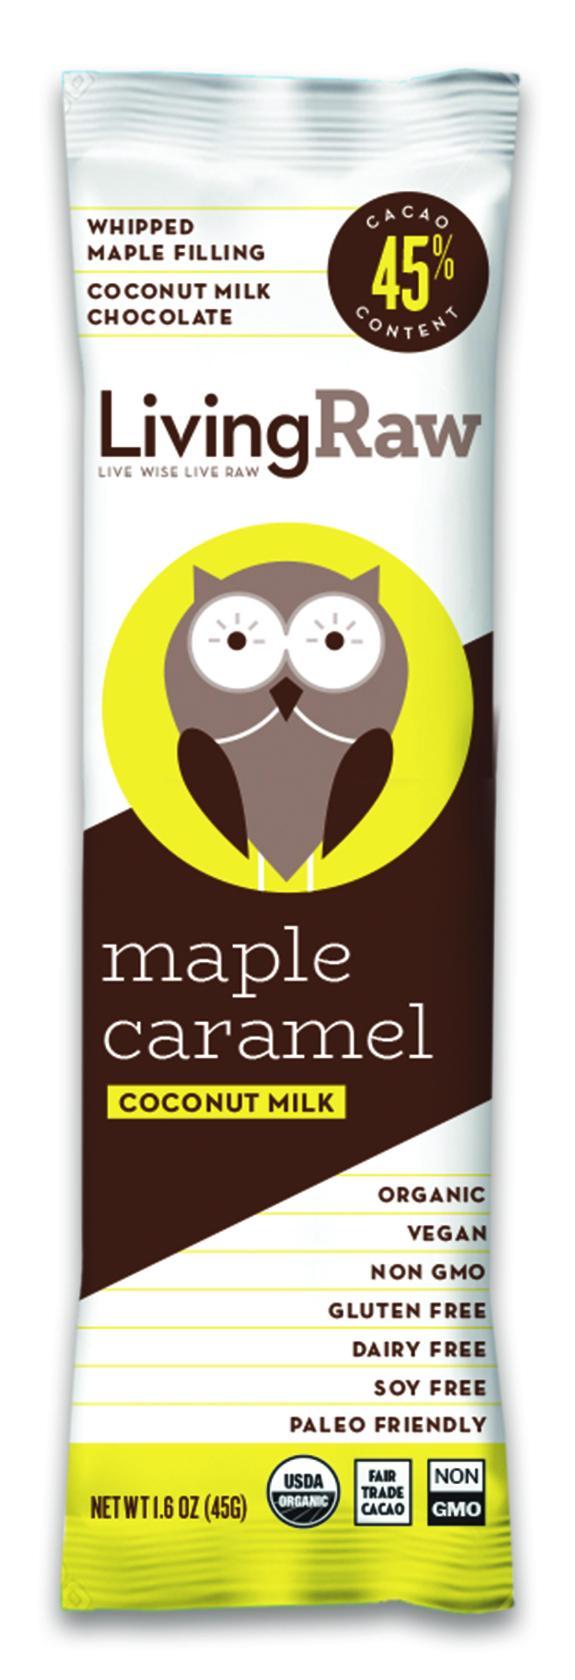 Maple Caramel